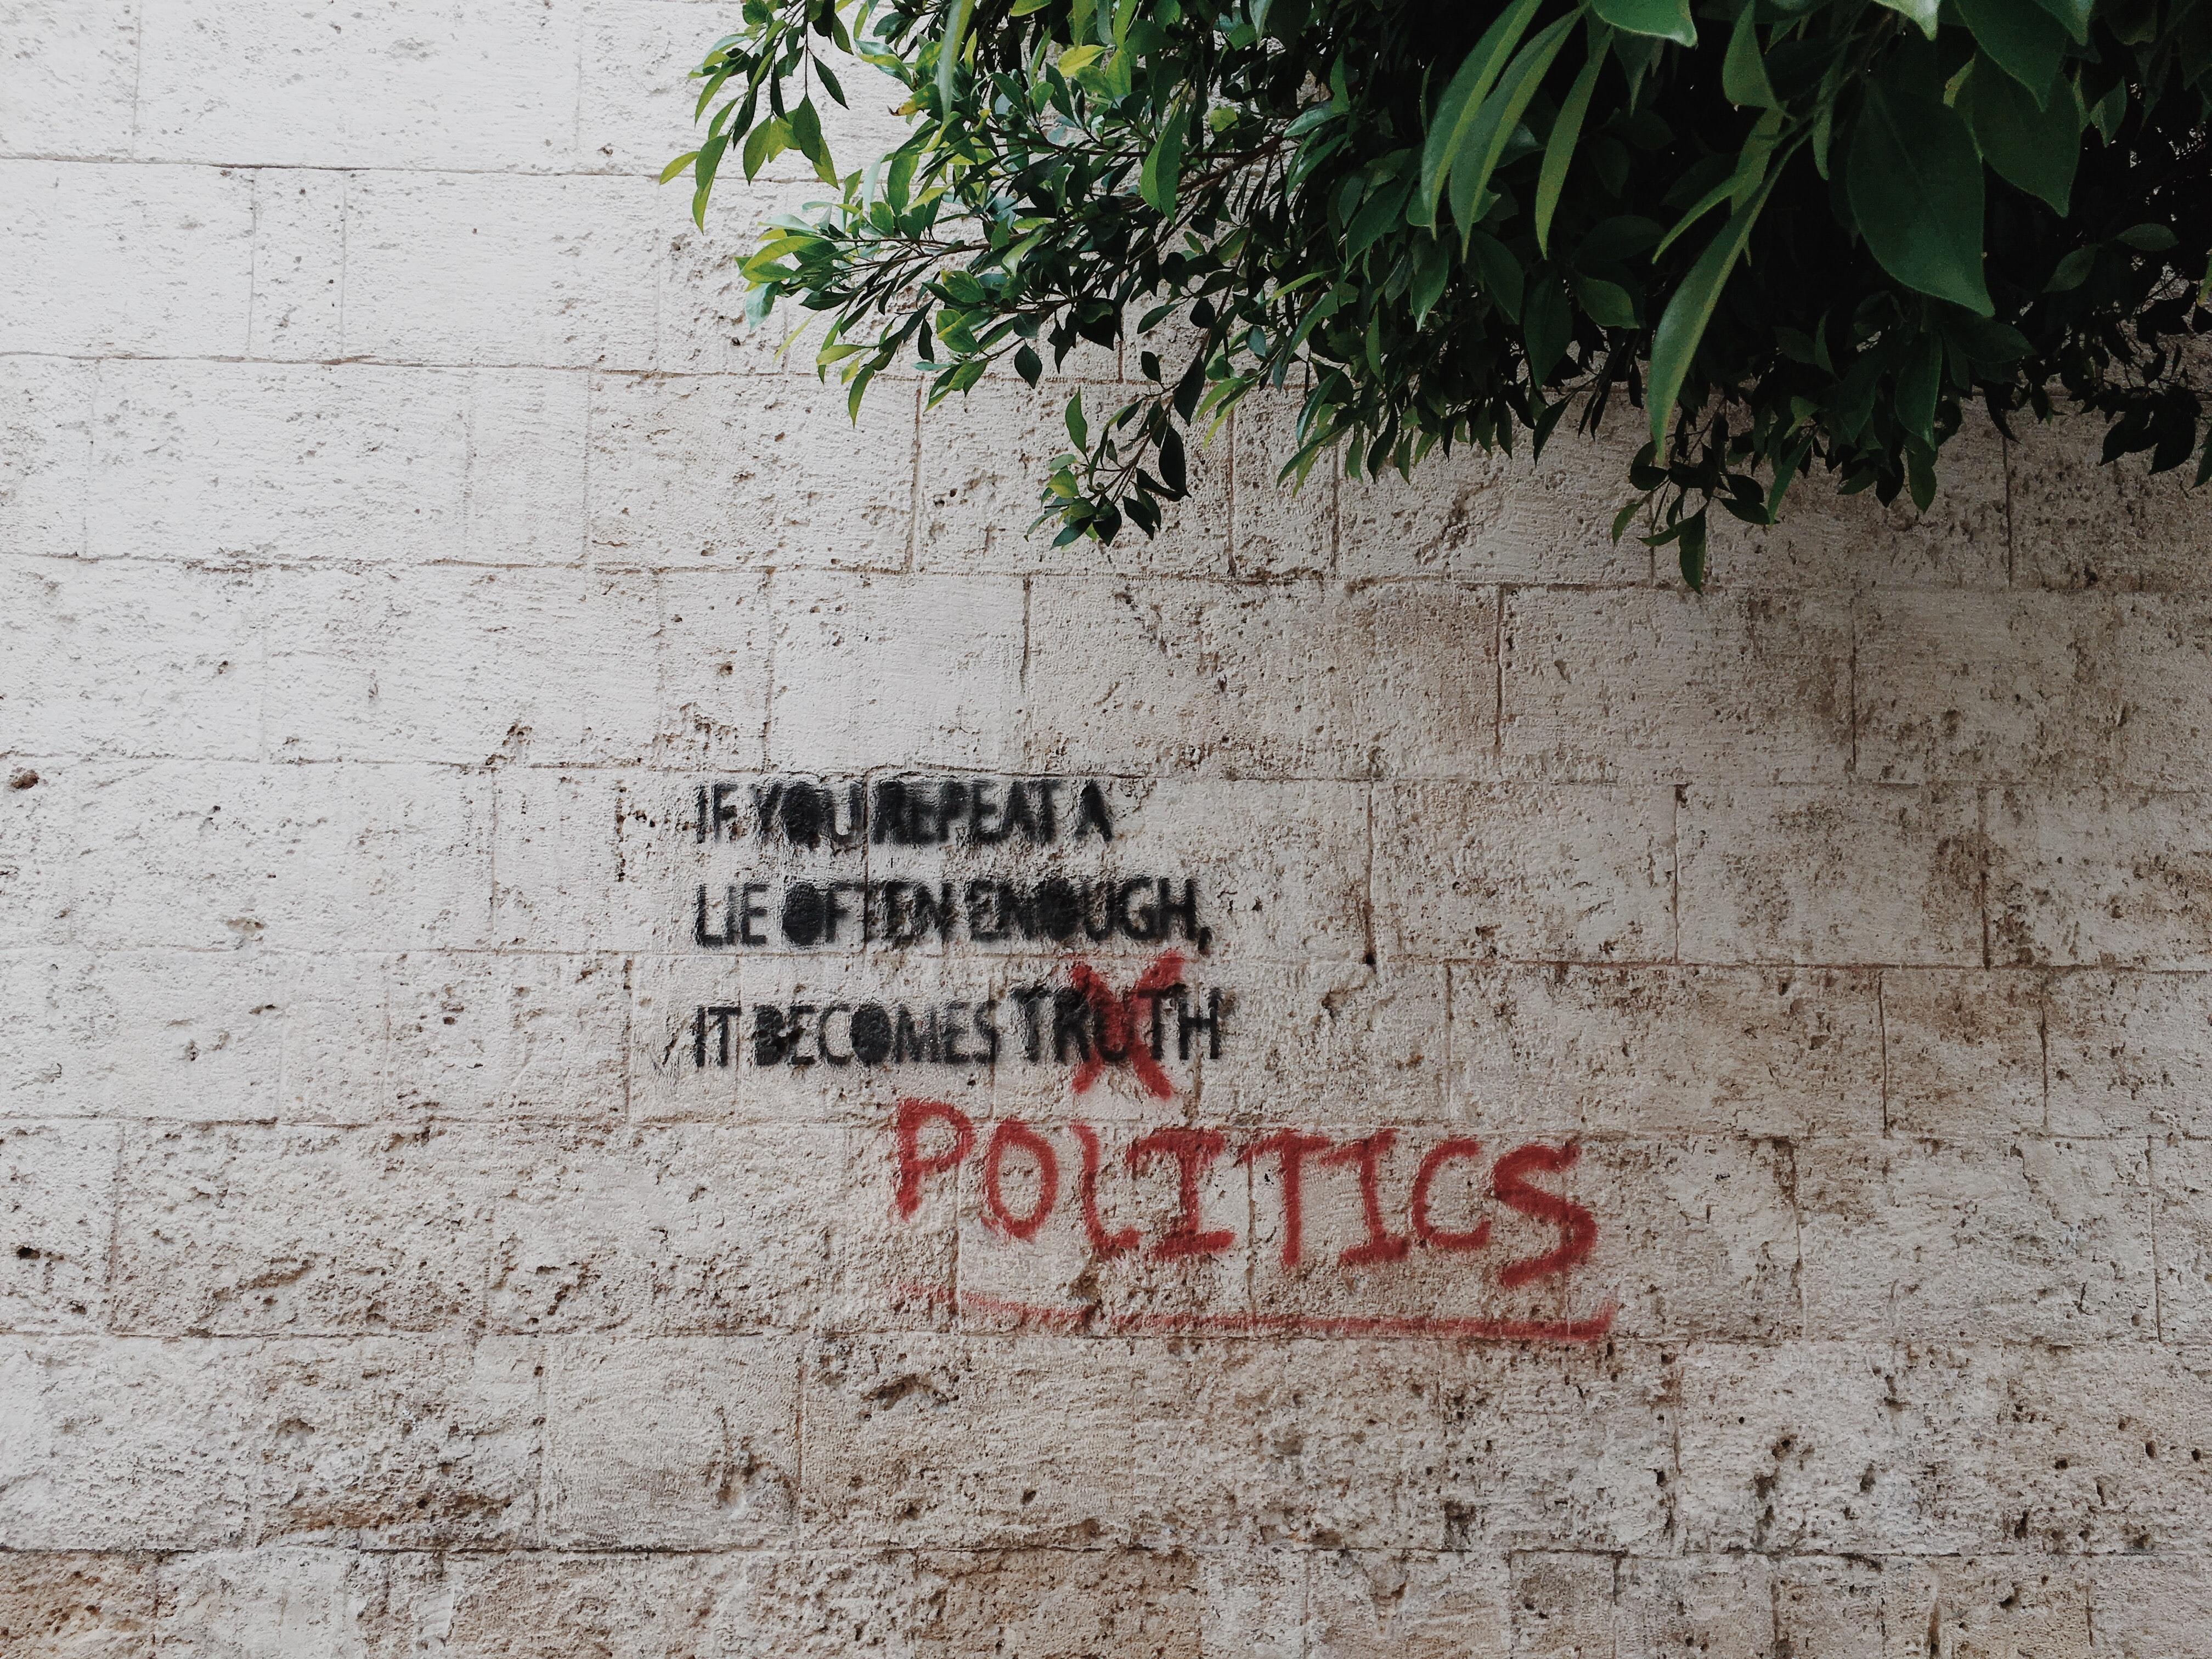 "Image of writing on an outdoor wall, ""If you repeat a lie often enough, it becomes t̶r̶u̶t̶h̶ politics."" Photo courtesy of Brian Wertheim via Unsplash."